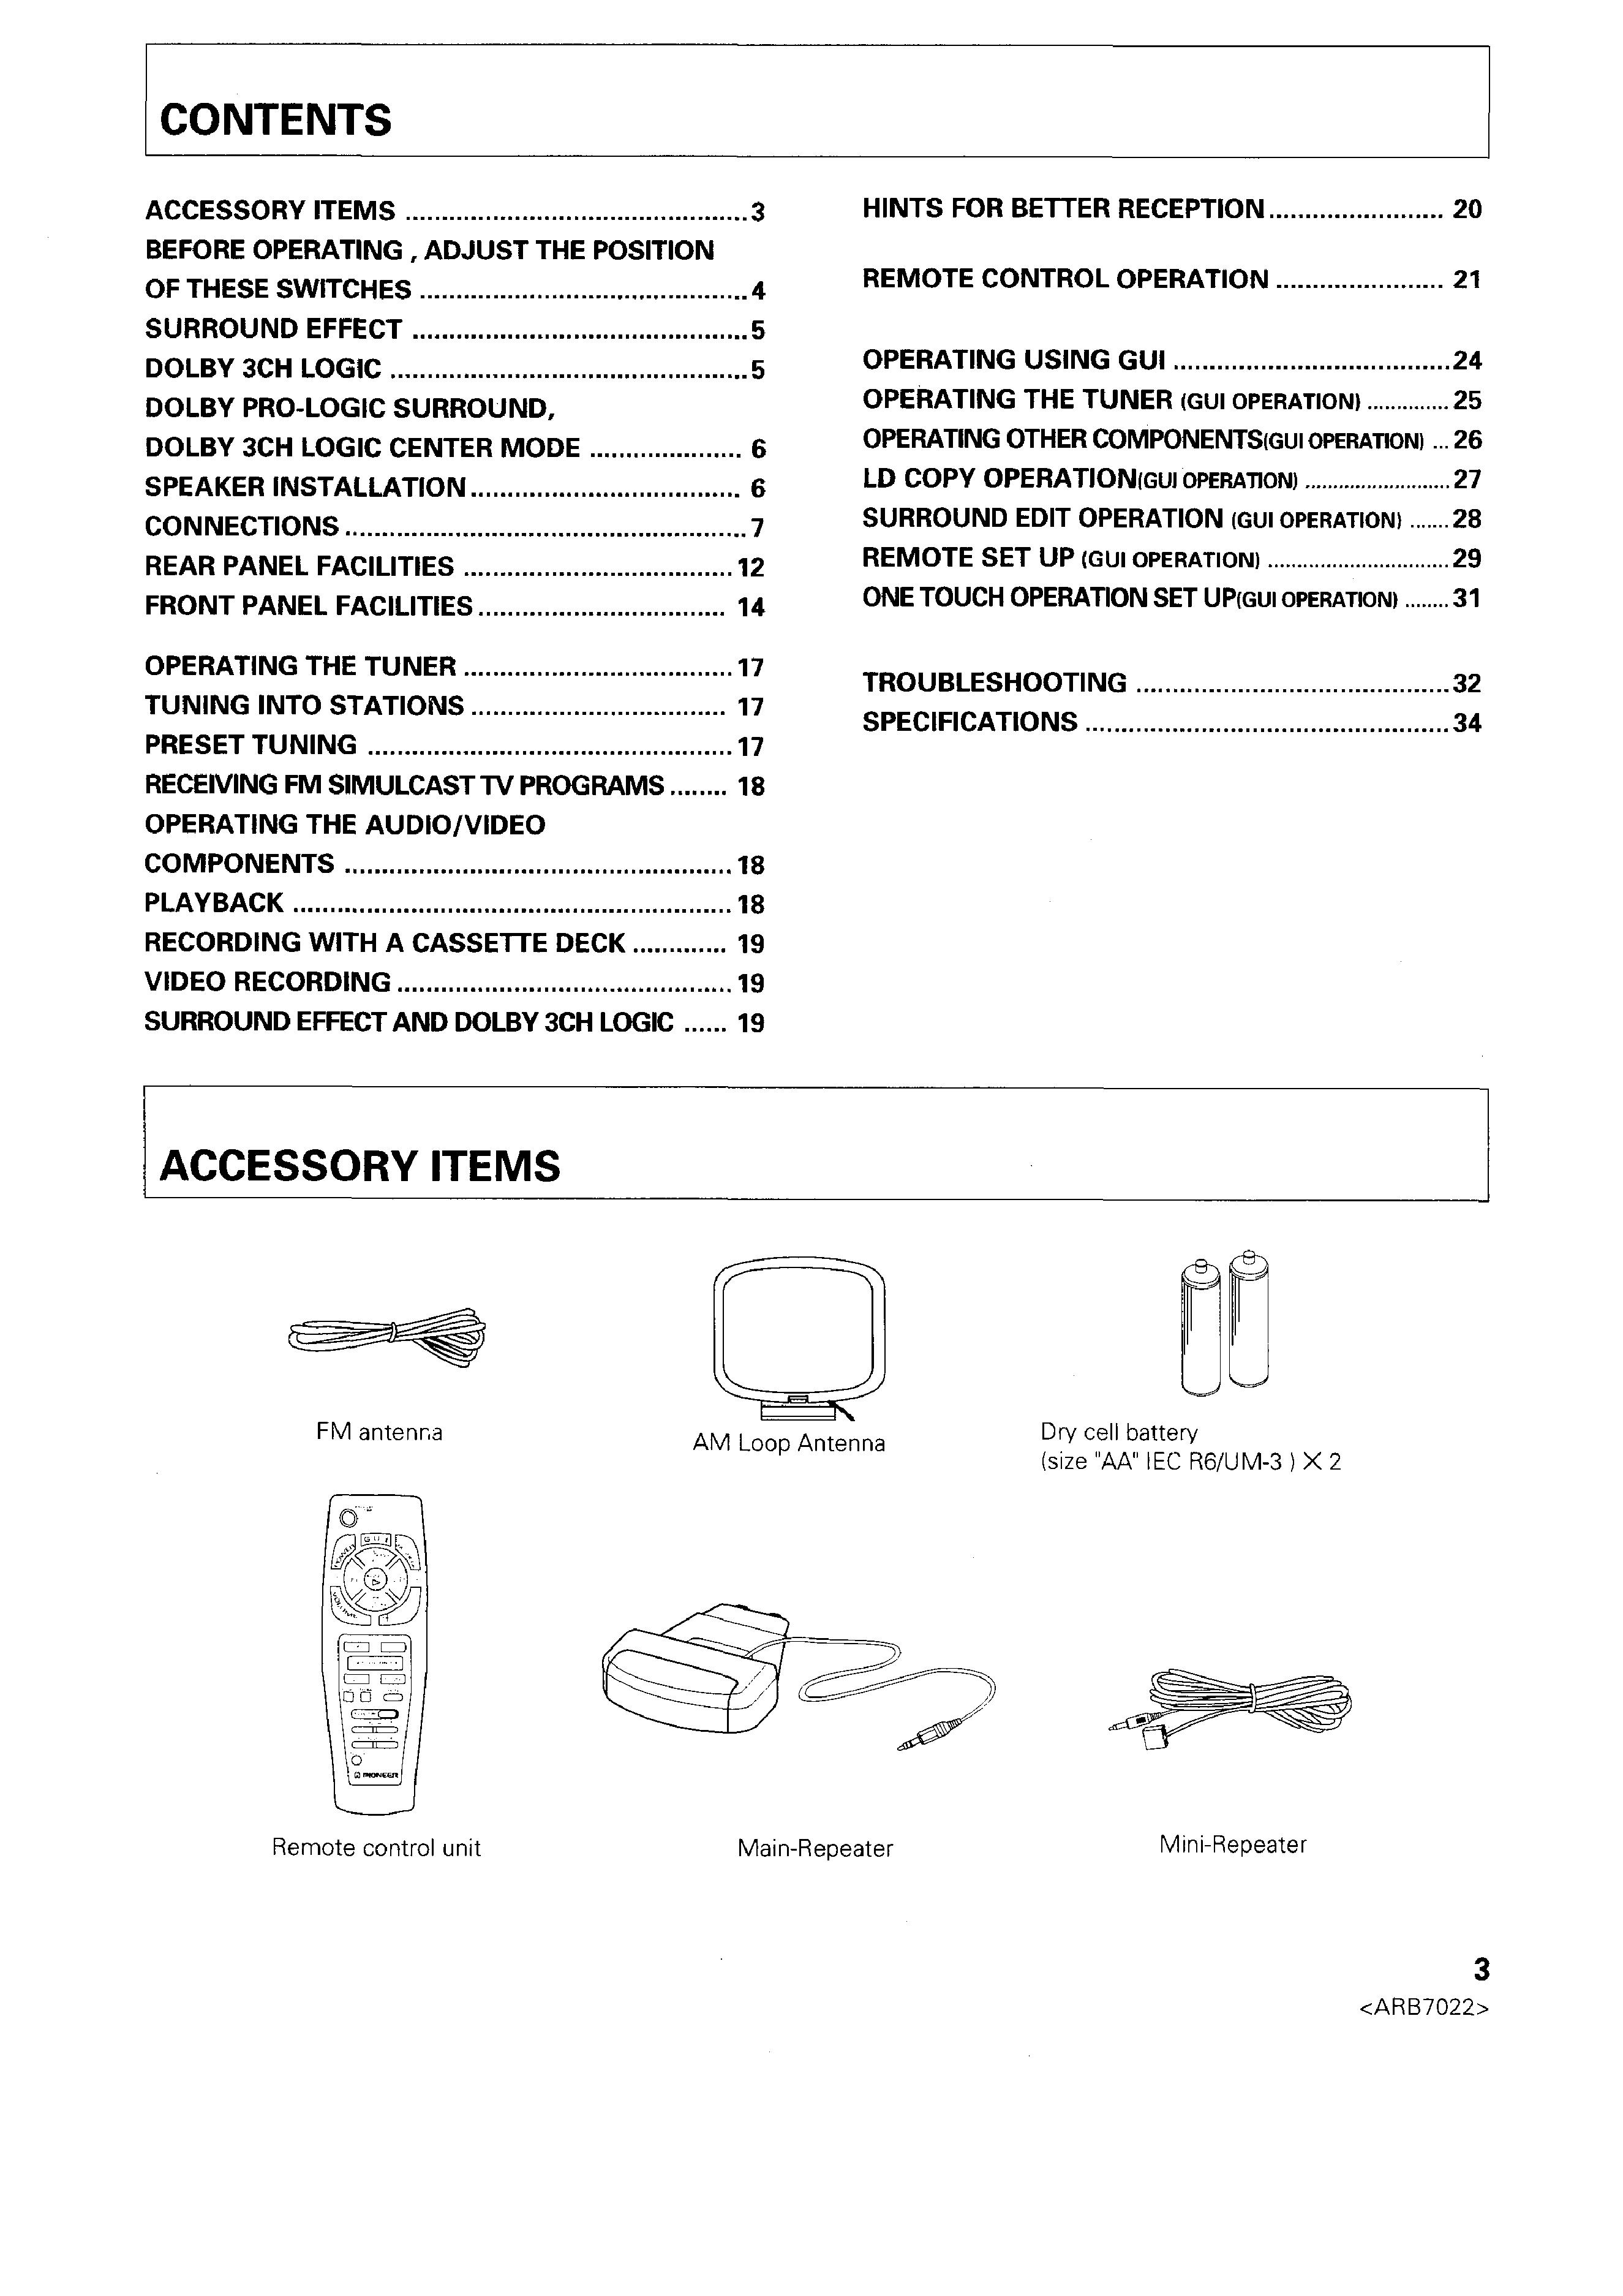 pioneer vsx 531 user manual english